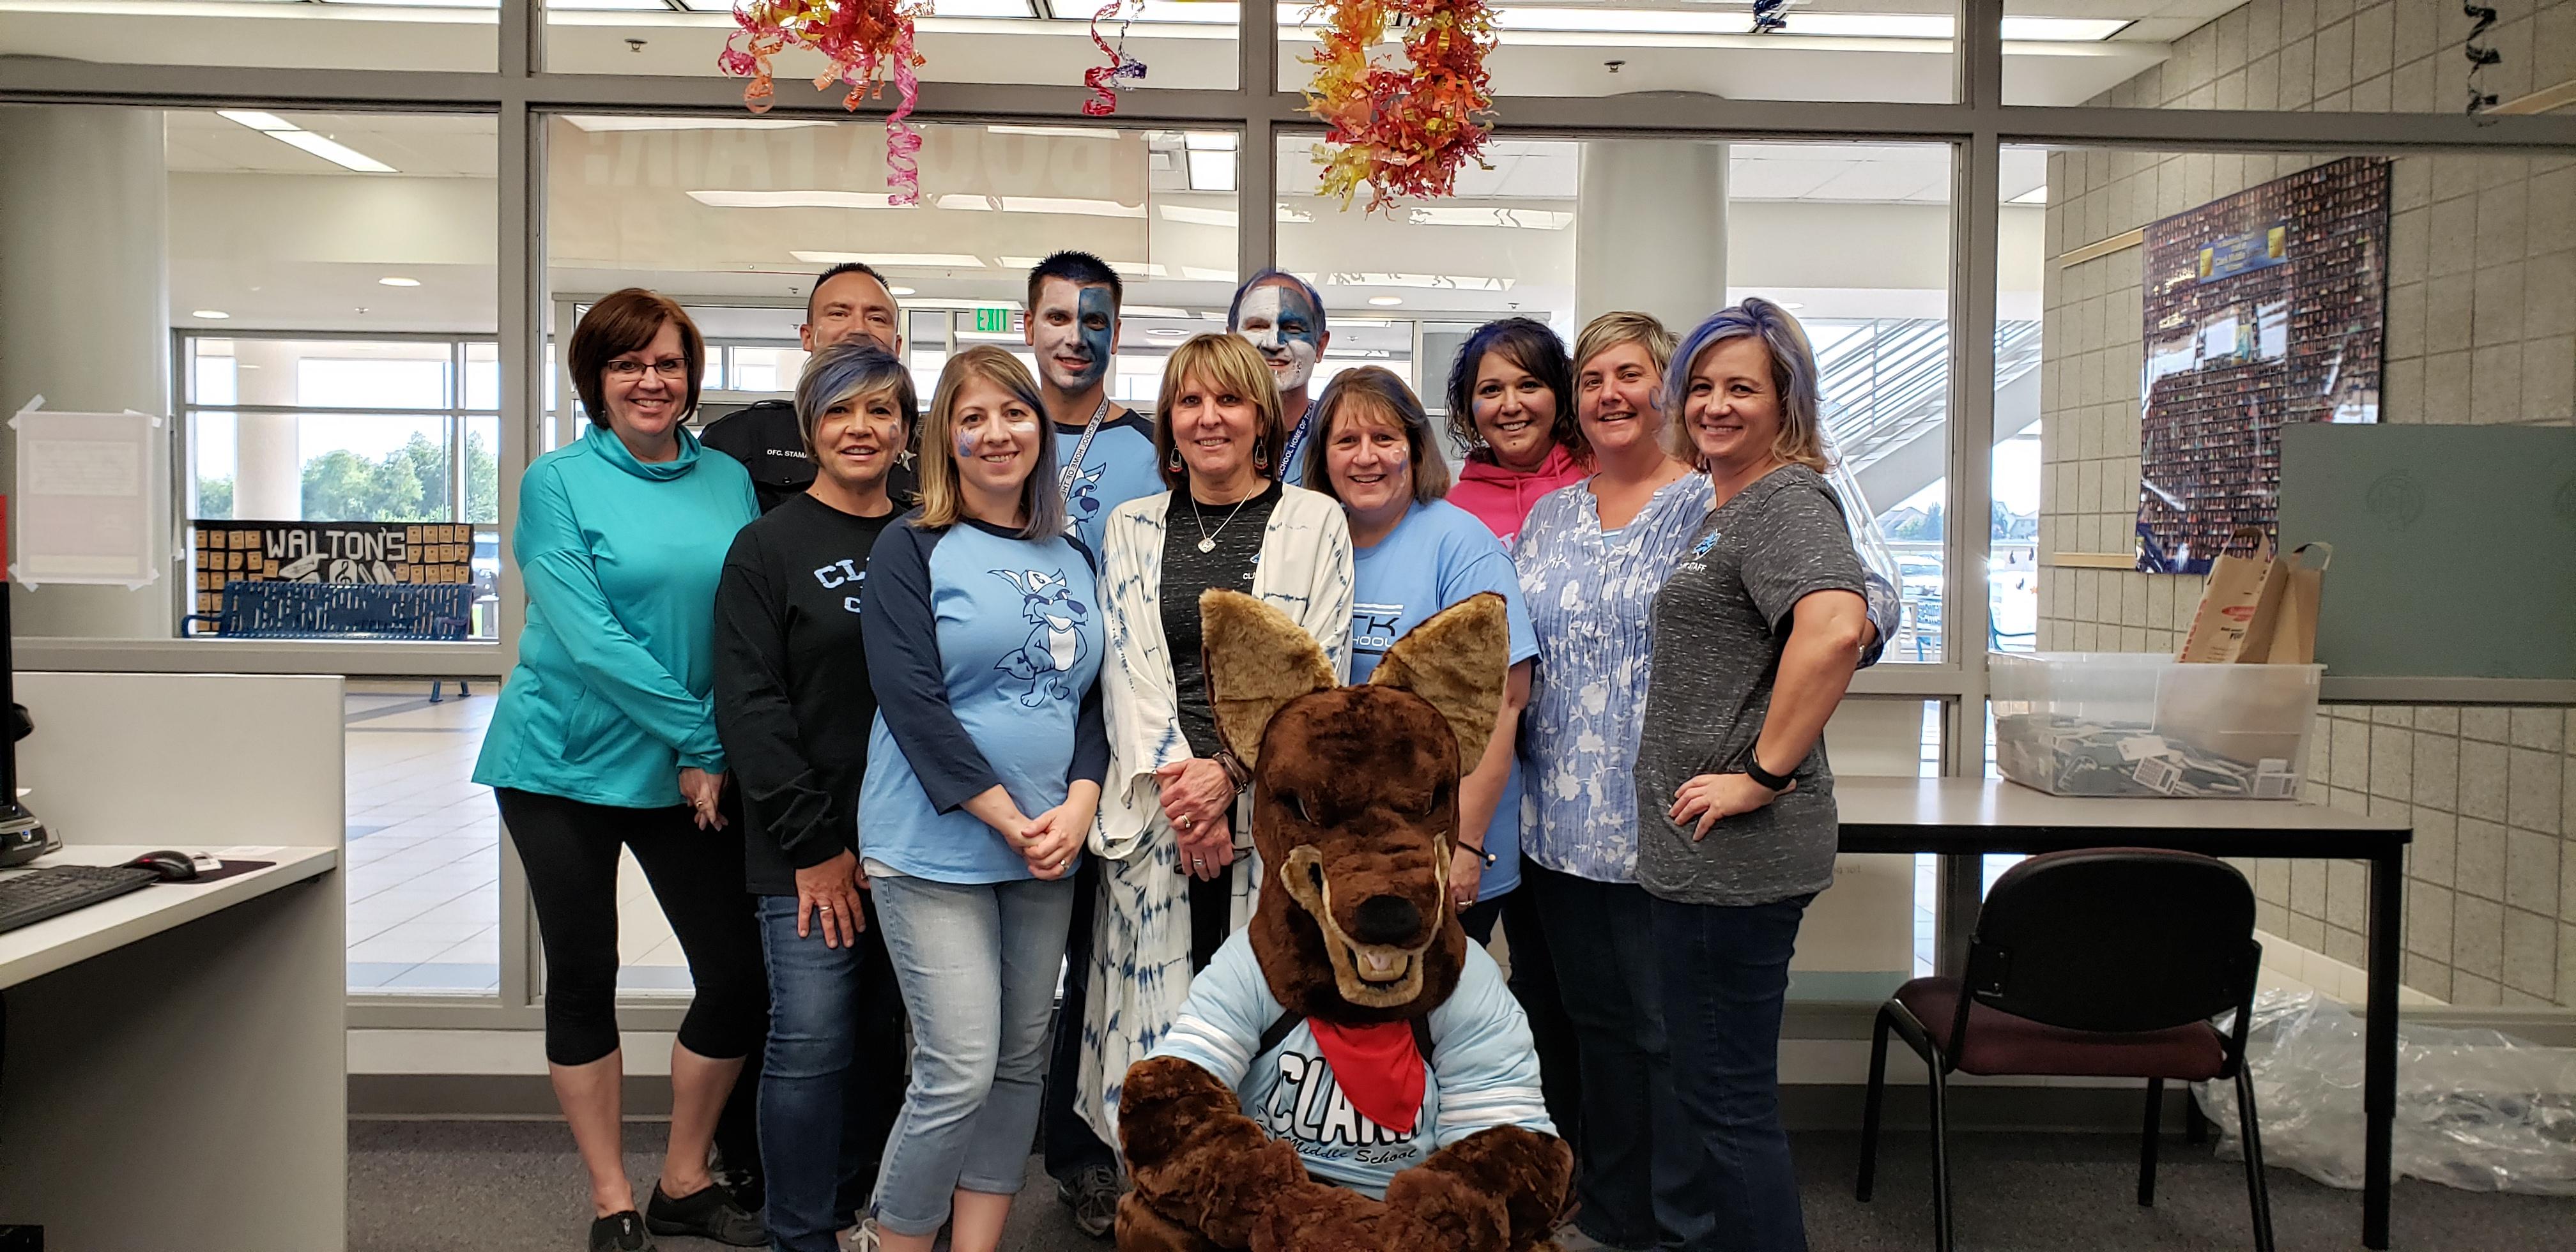 Clark Middle School Office Staff showing their school spirit!!!